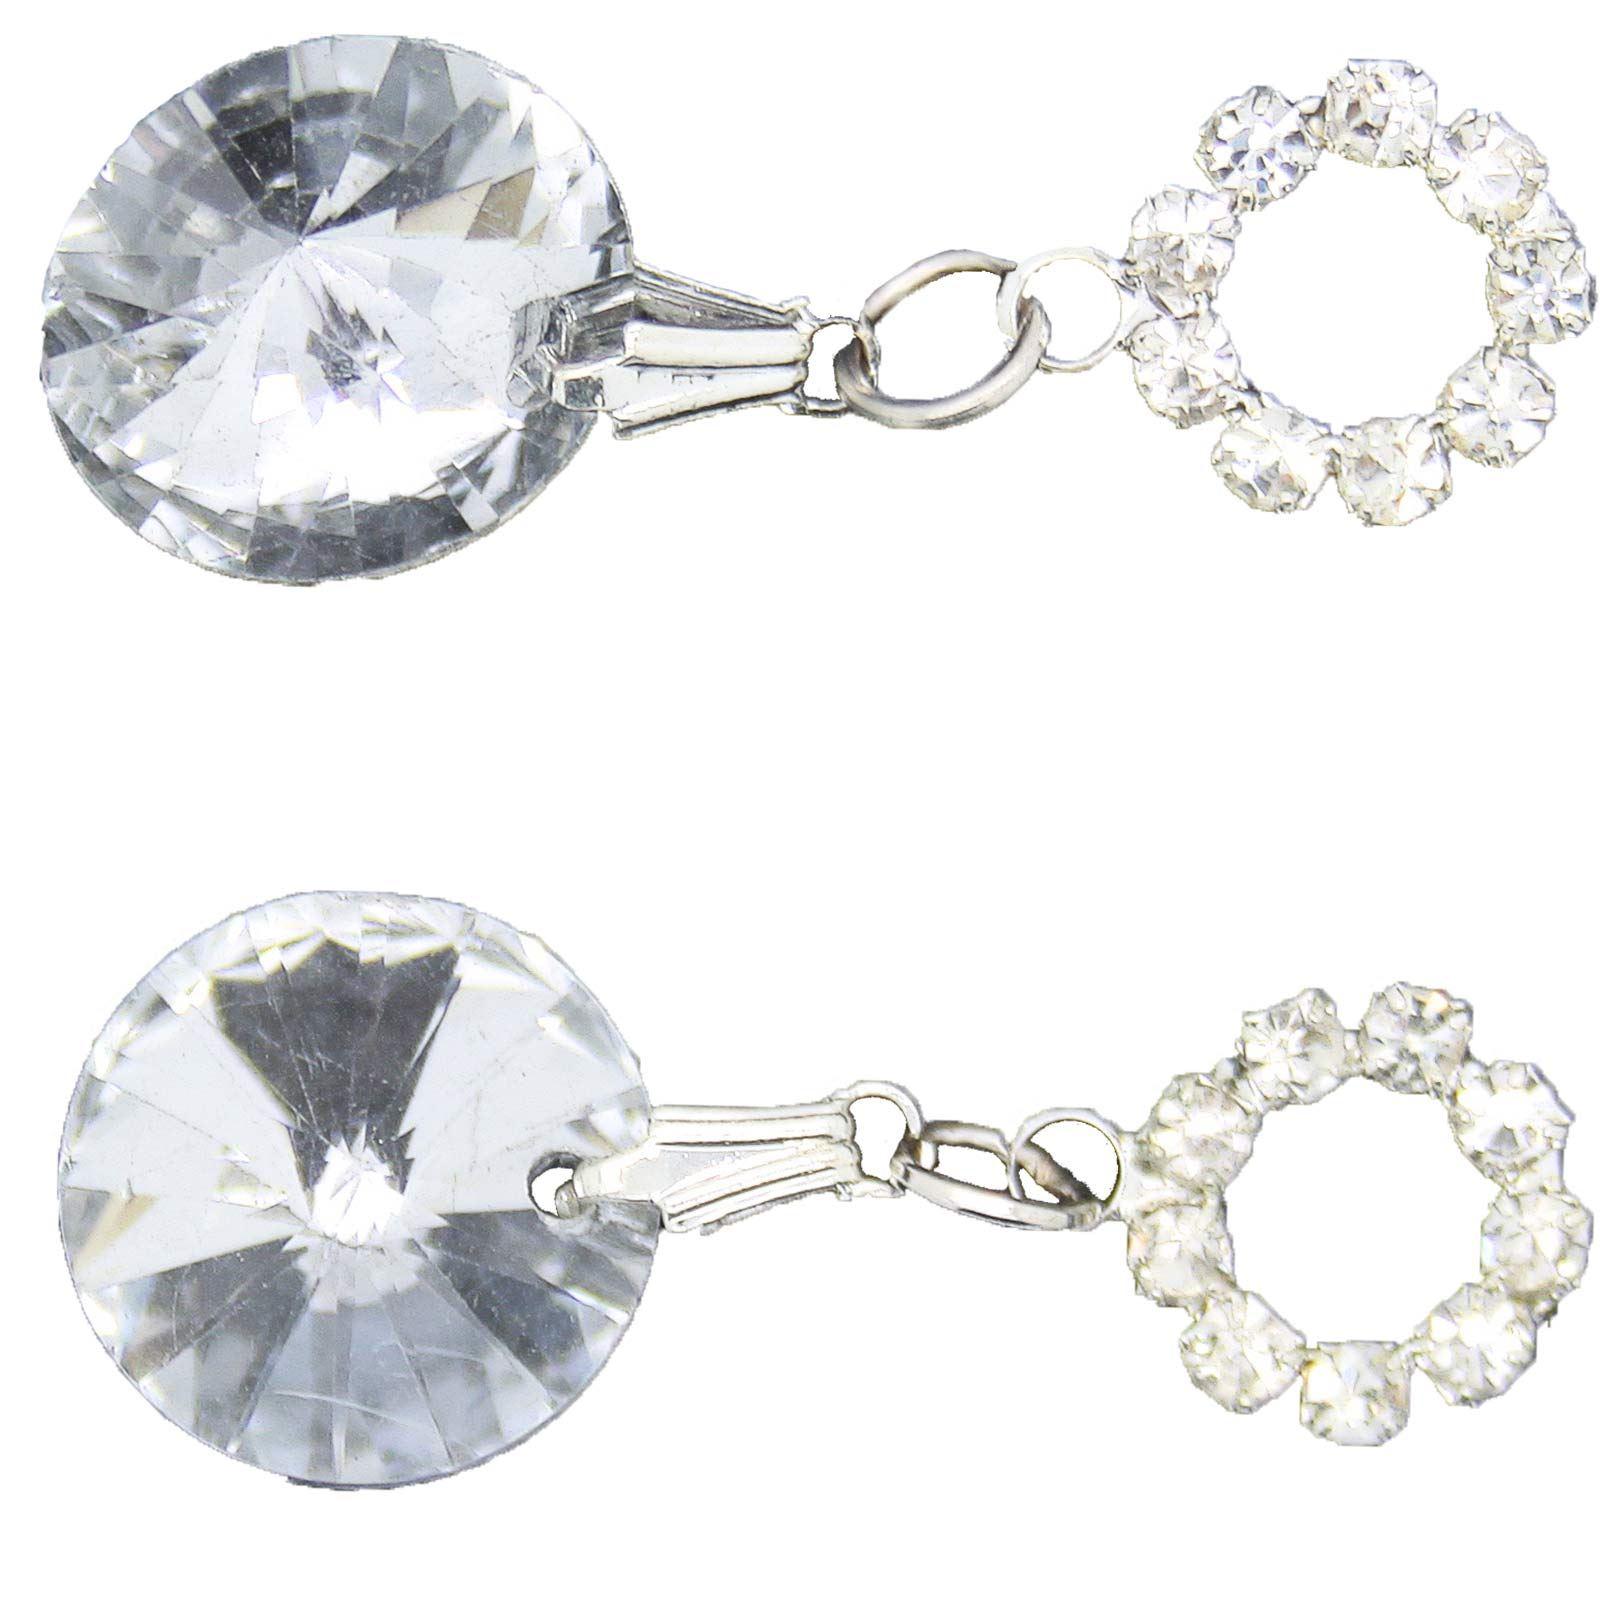 True-Face-Ladies-Women-039-s-Elegant-Earrings-Necklace-Set-Metal-Alloy-Jewellery thumbnail 15